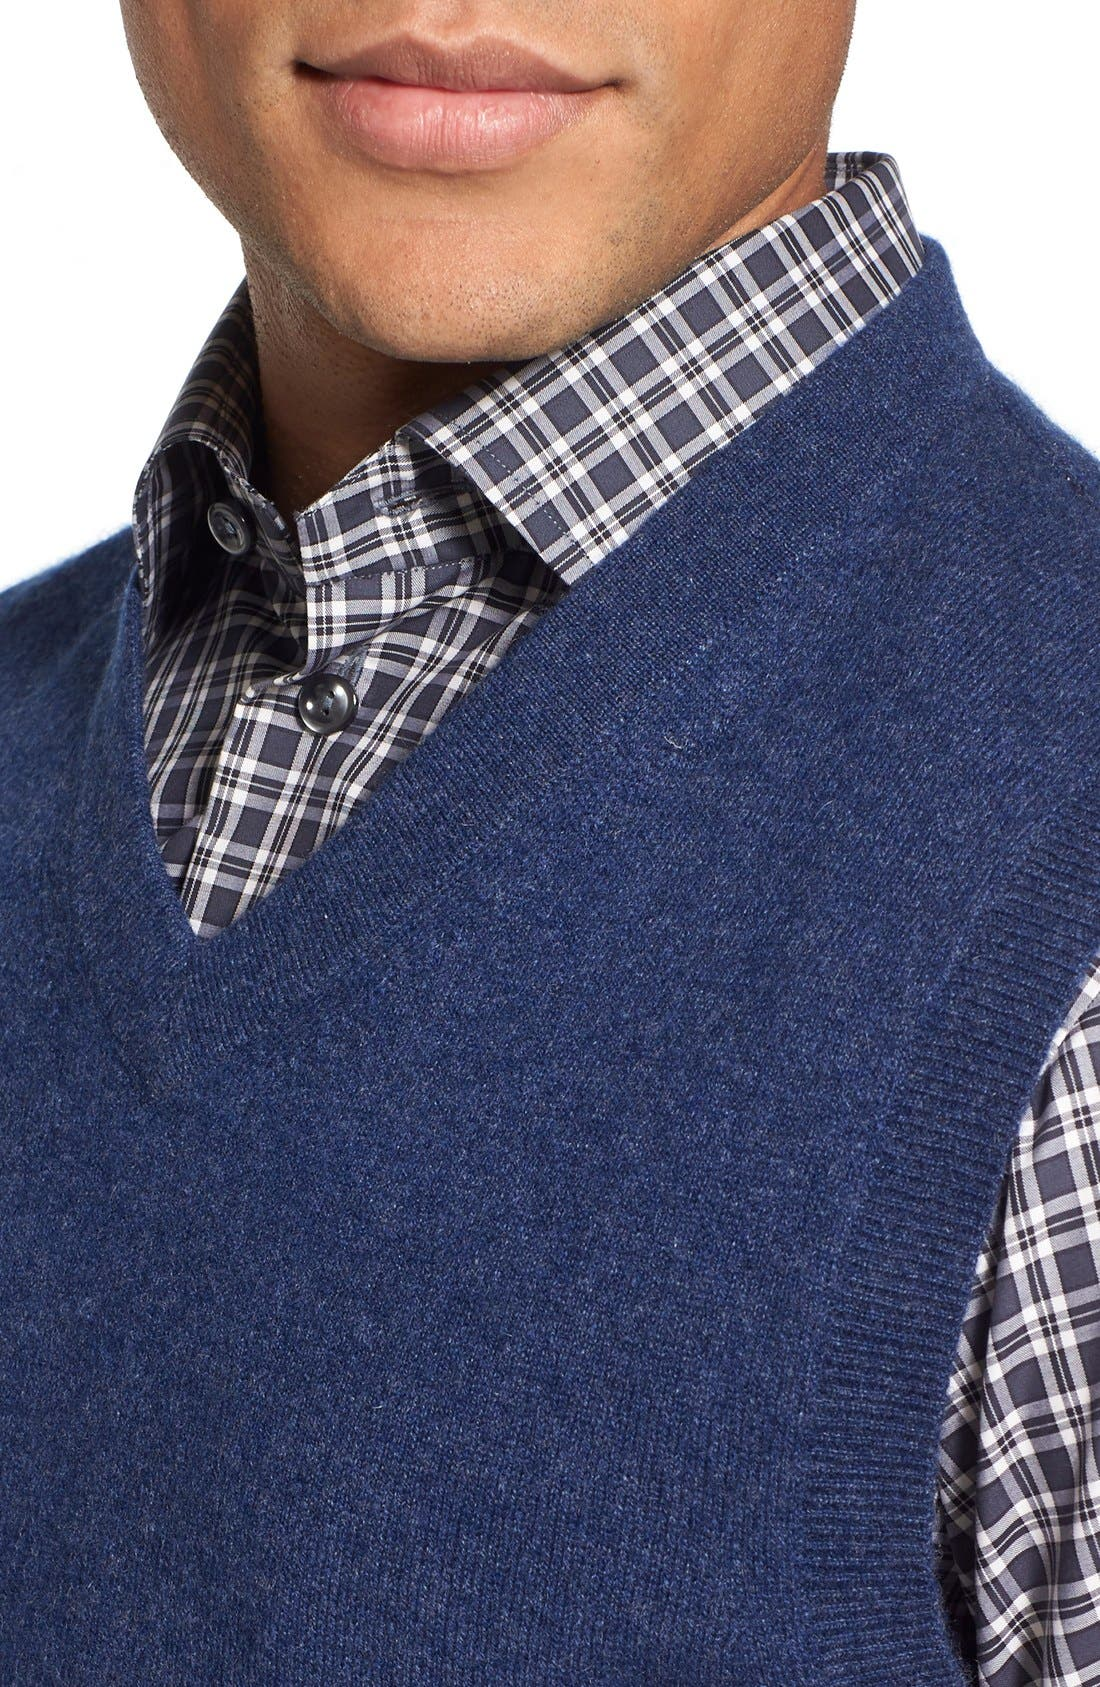 Cashmere V-Neck Sweater Vest,                             Alternate thumbnail 8, color,                             420